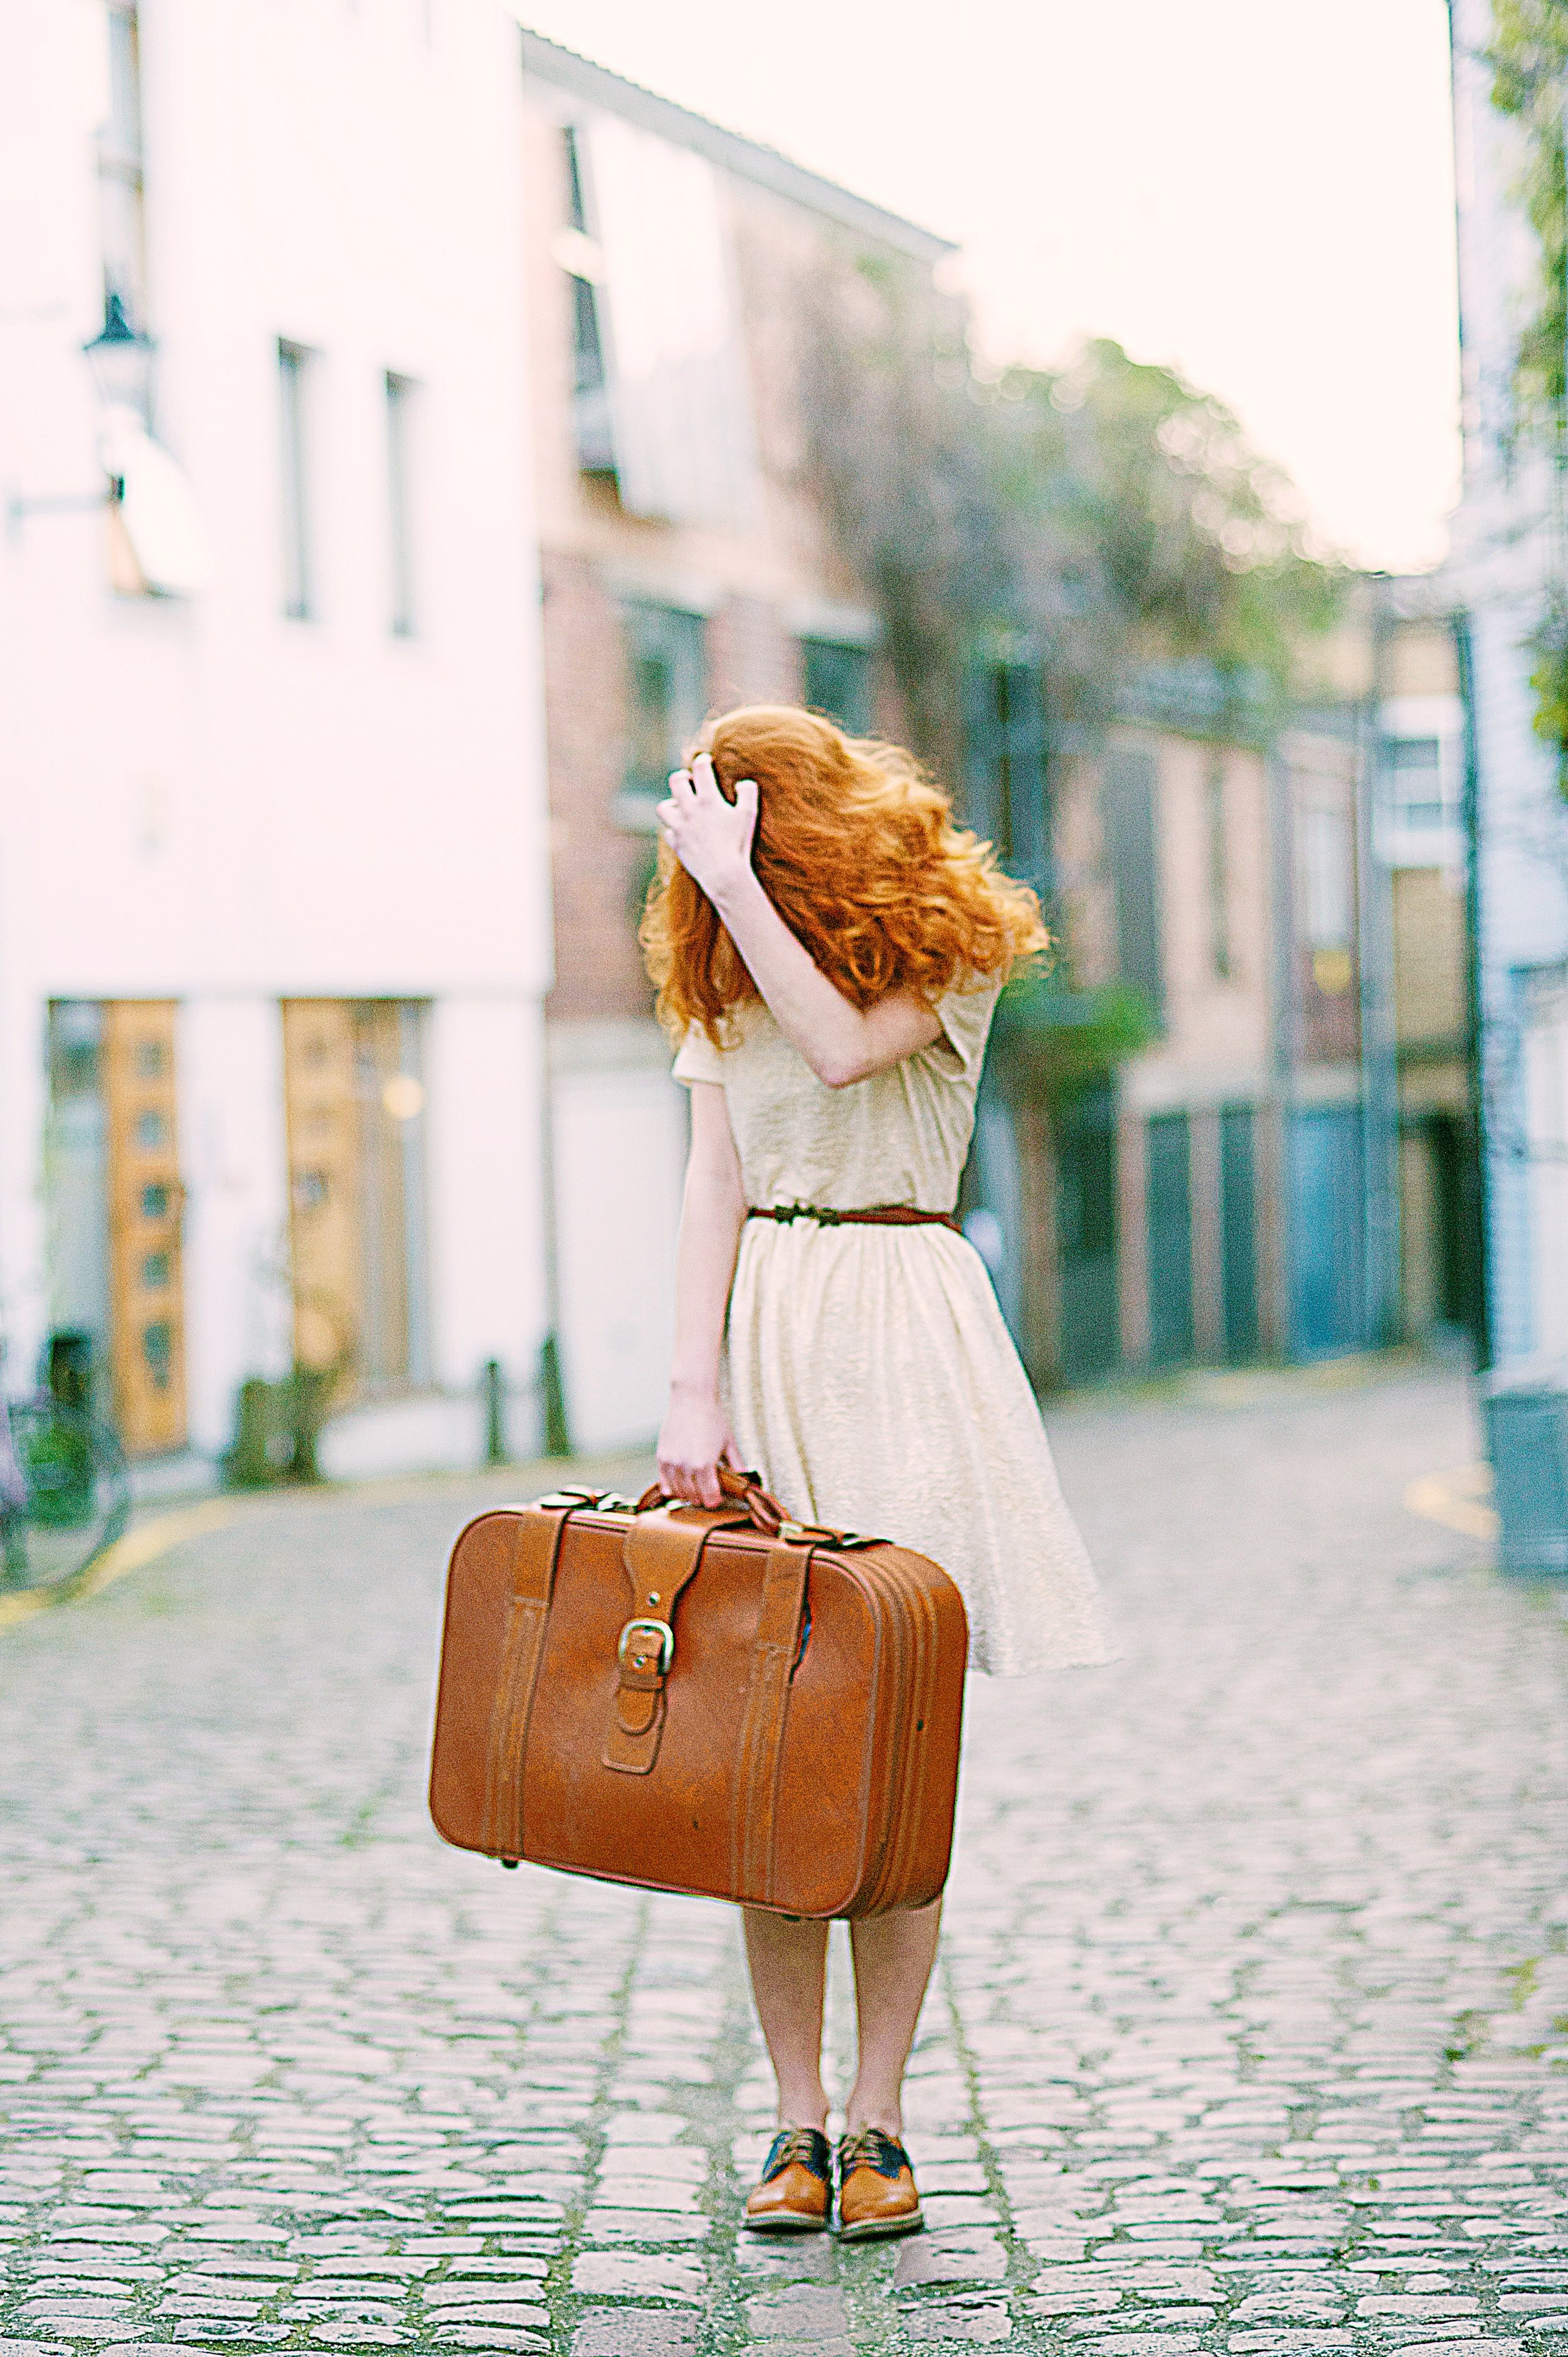 bag-cute-dress-1071078.jpg